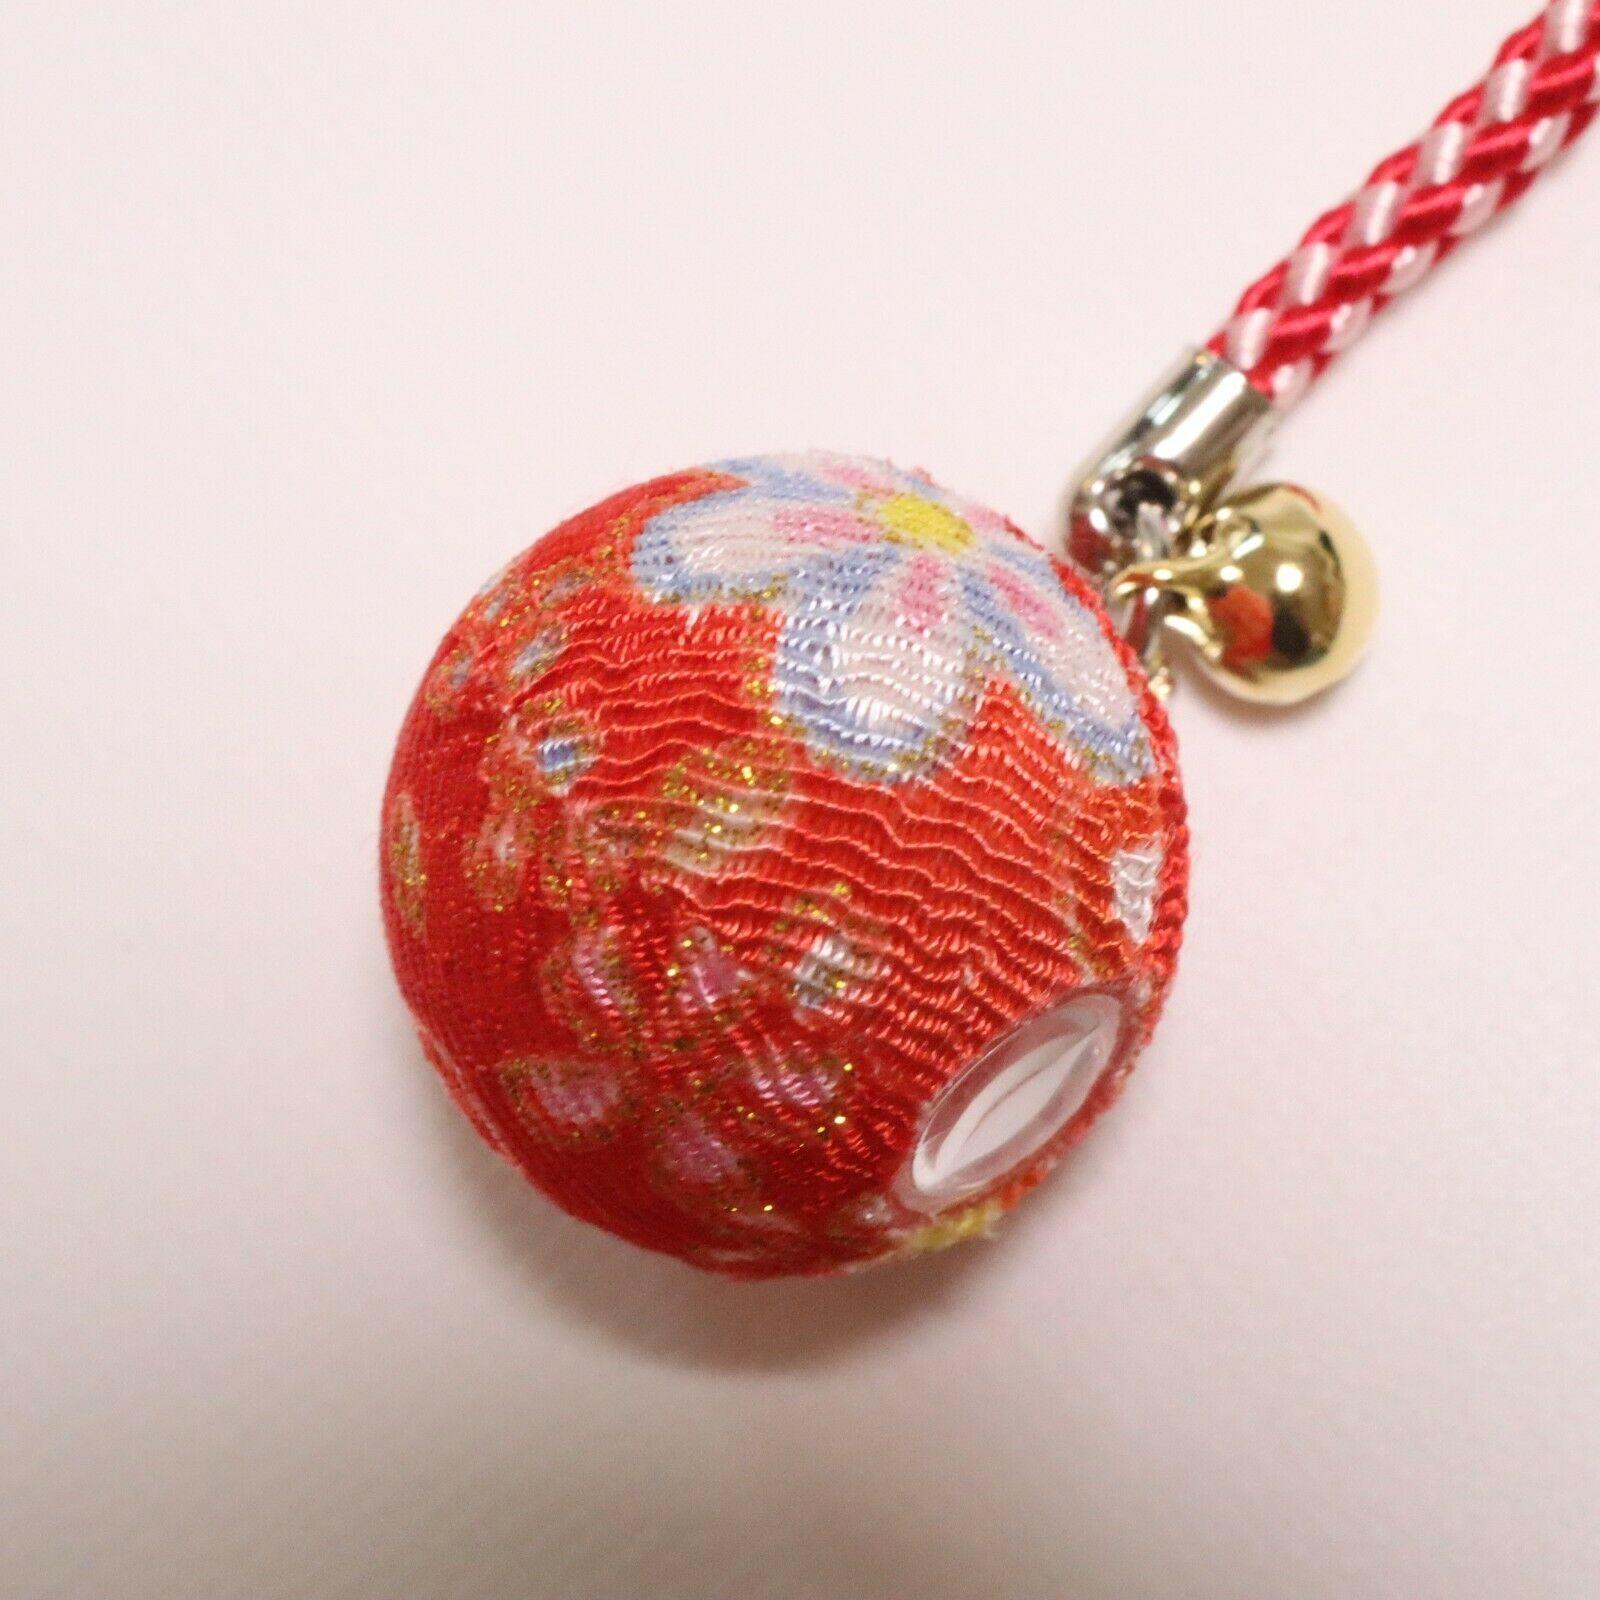 F//S Japanese Kaleidoscope Mangekyo Chirimen Weave Crepe Fabric Strap Pink Kyoto